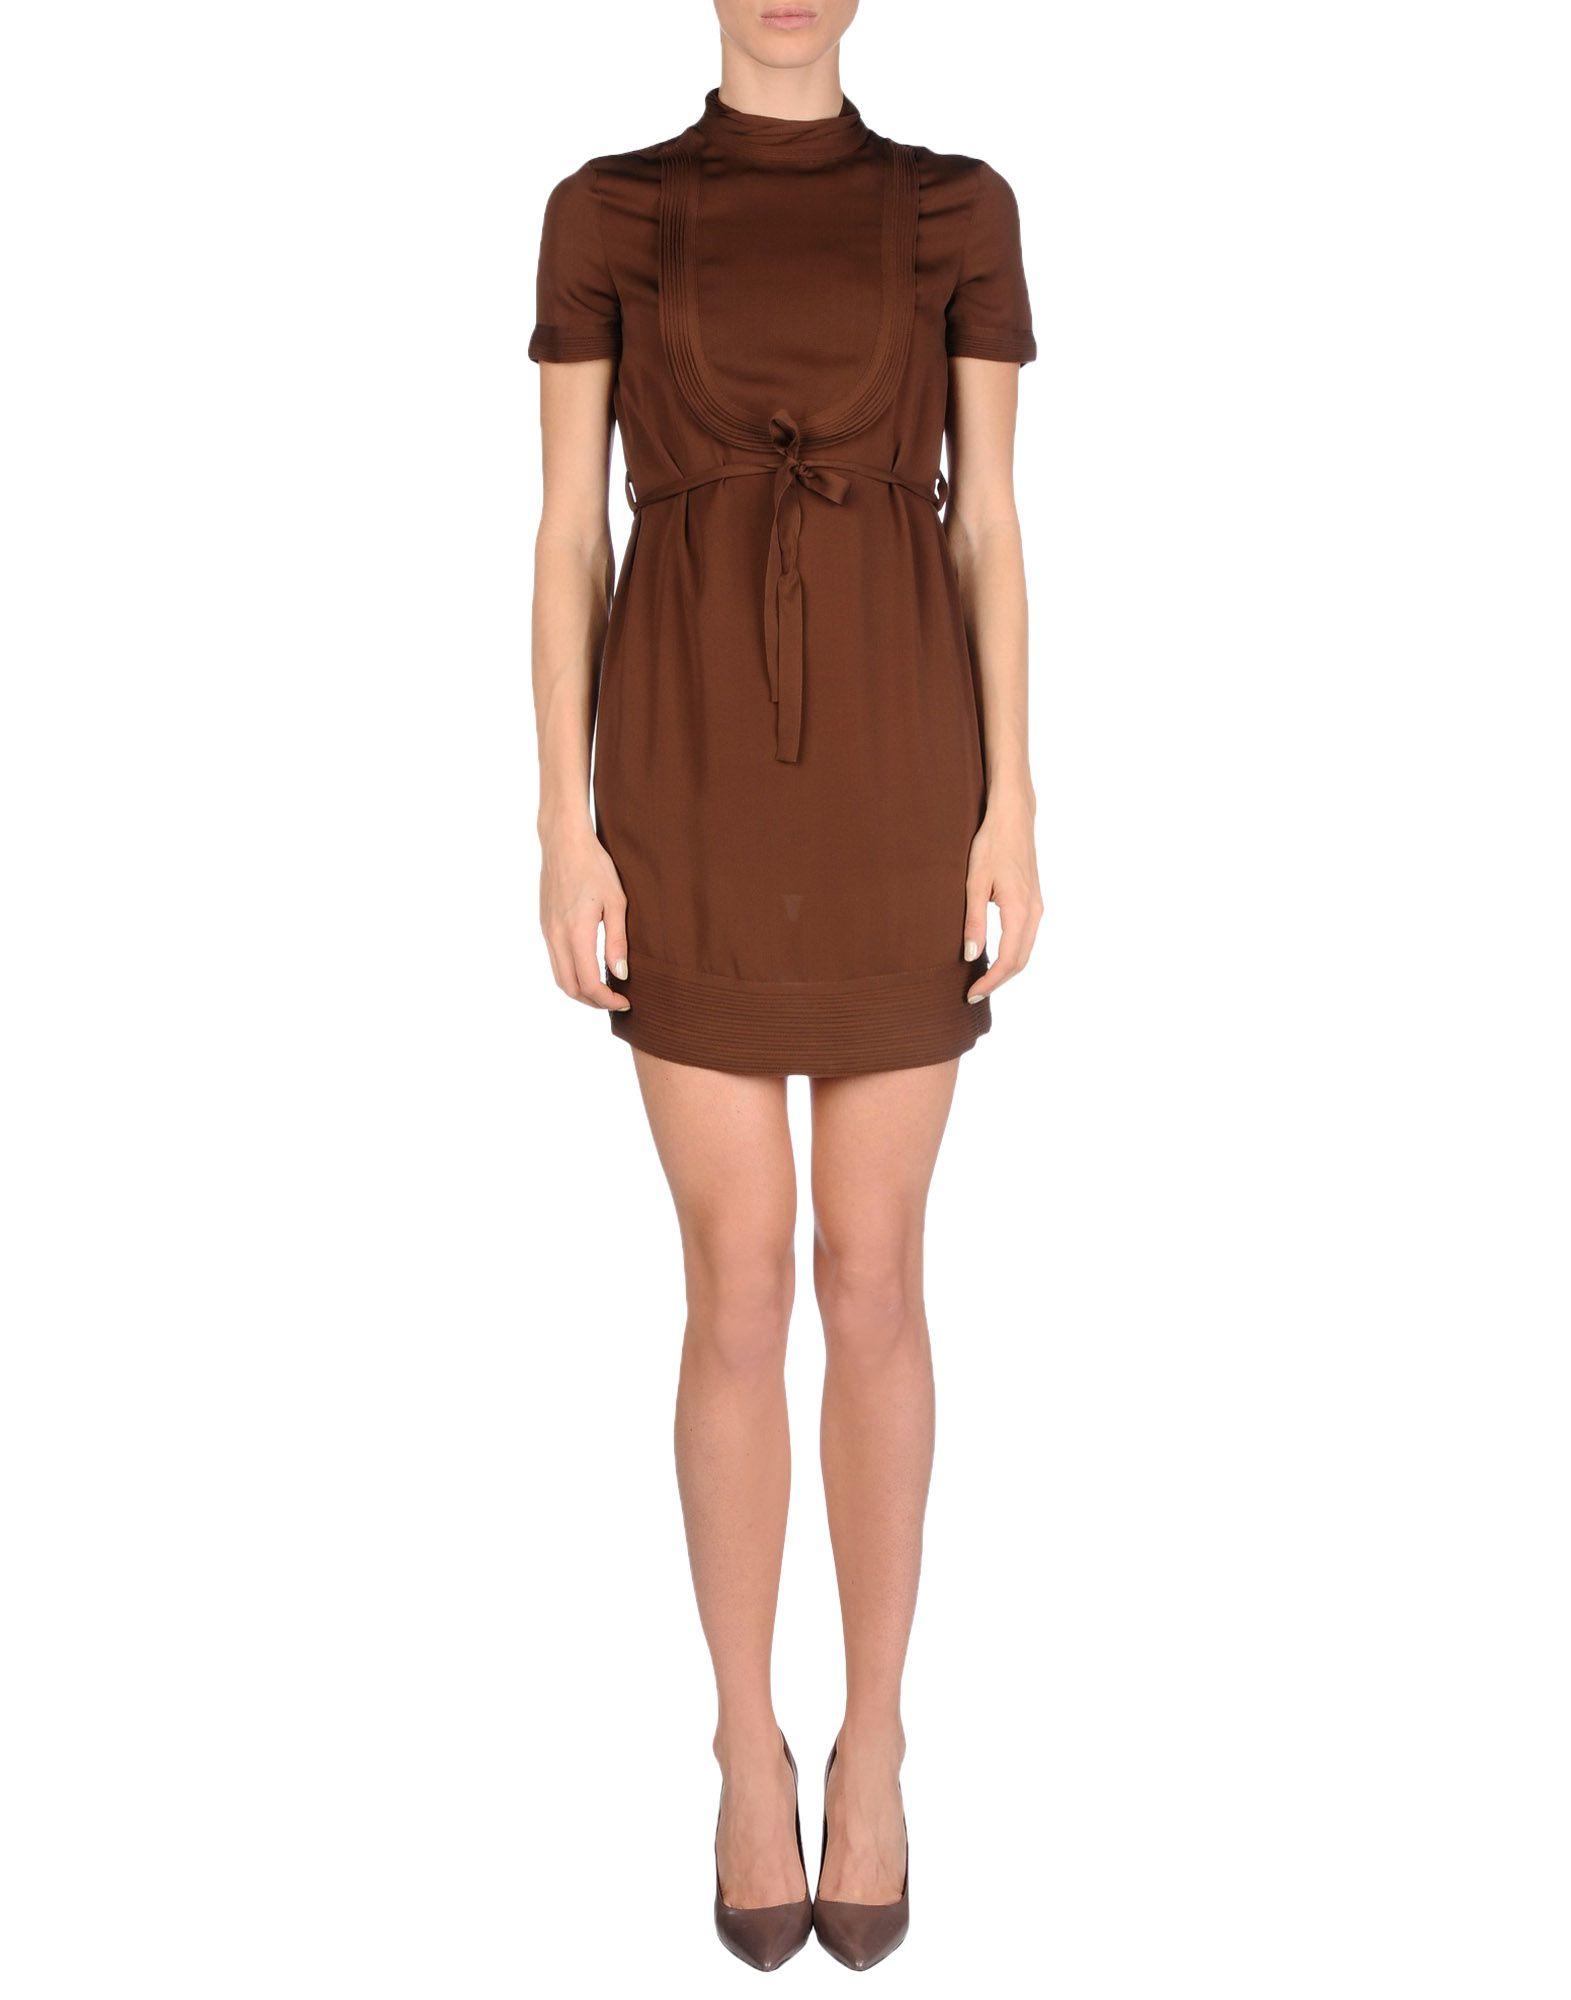 Lyst - Dsquaredu00b2 Short Dress in Brown